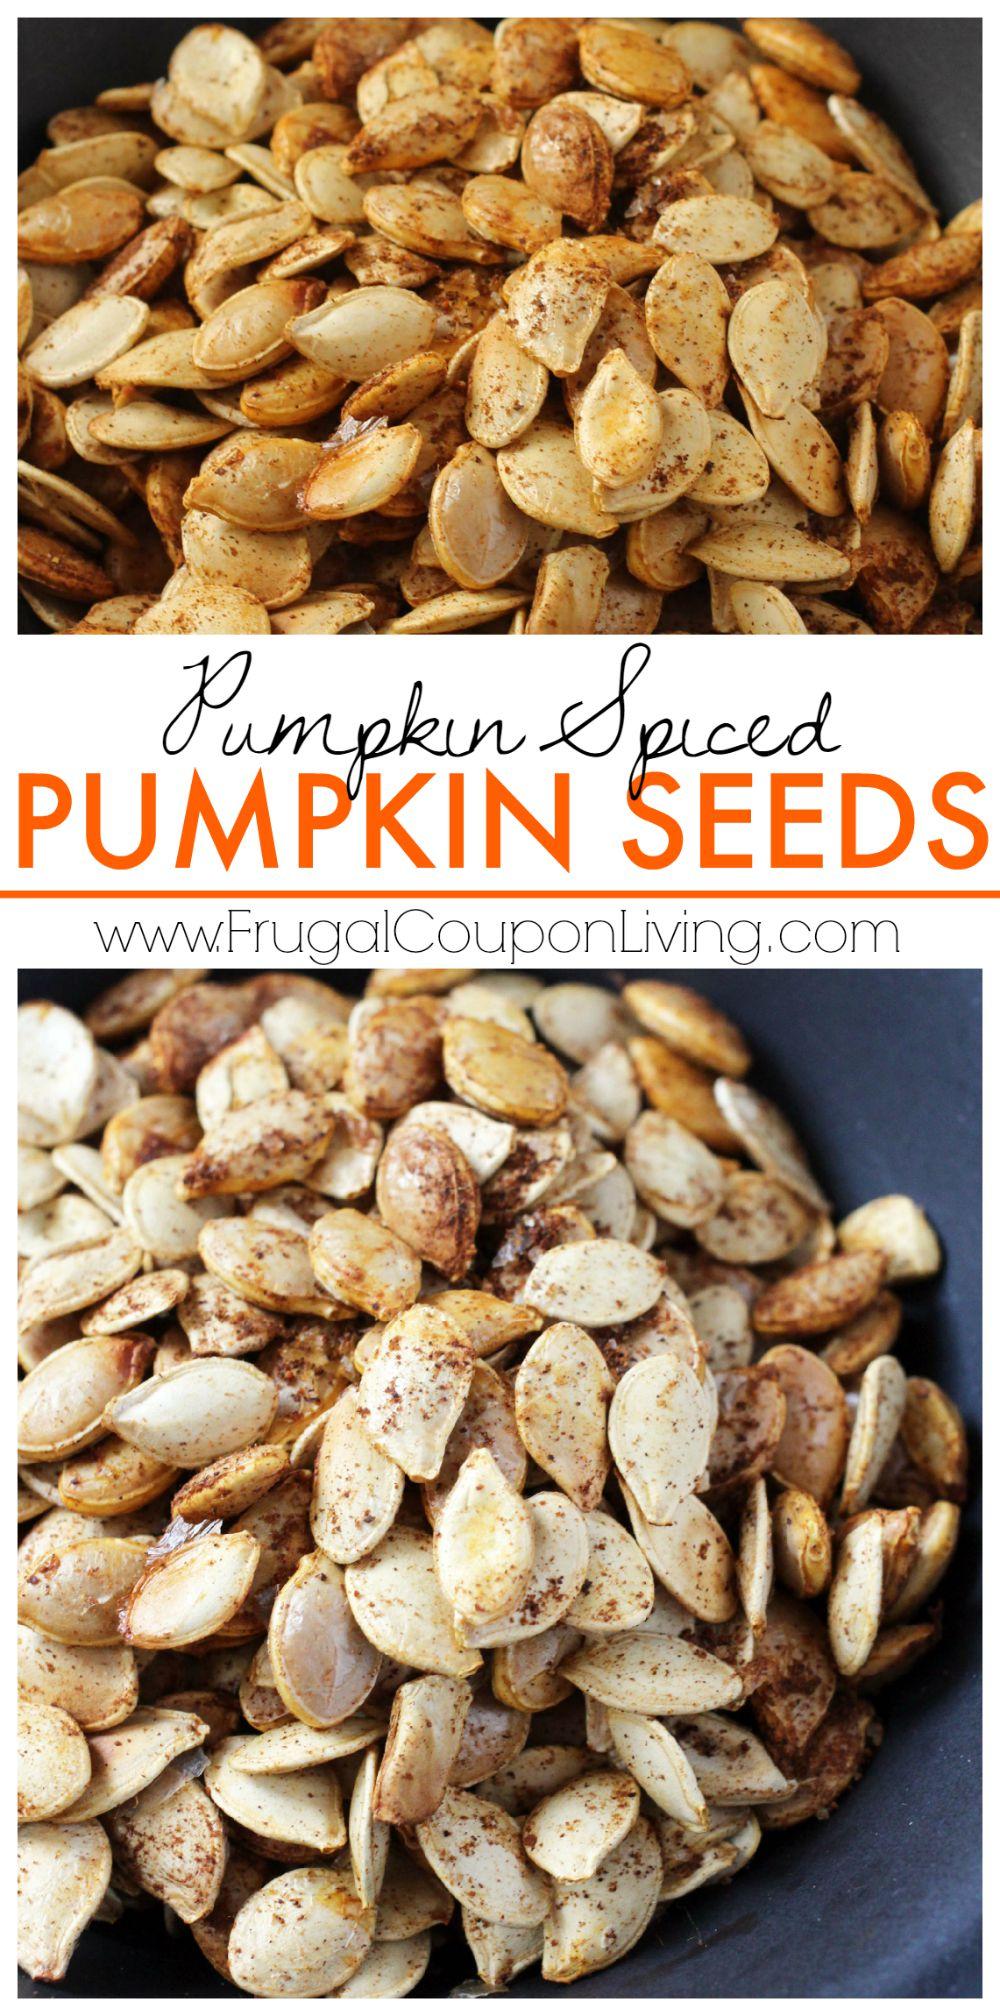 Pumpkin Spiced Pumpkin Seeds on Frugal Coupon Living